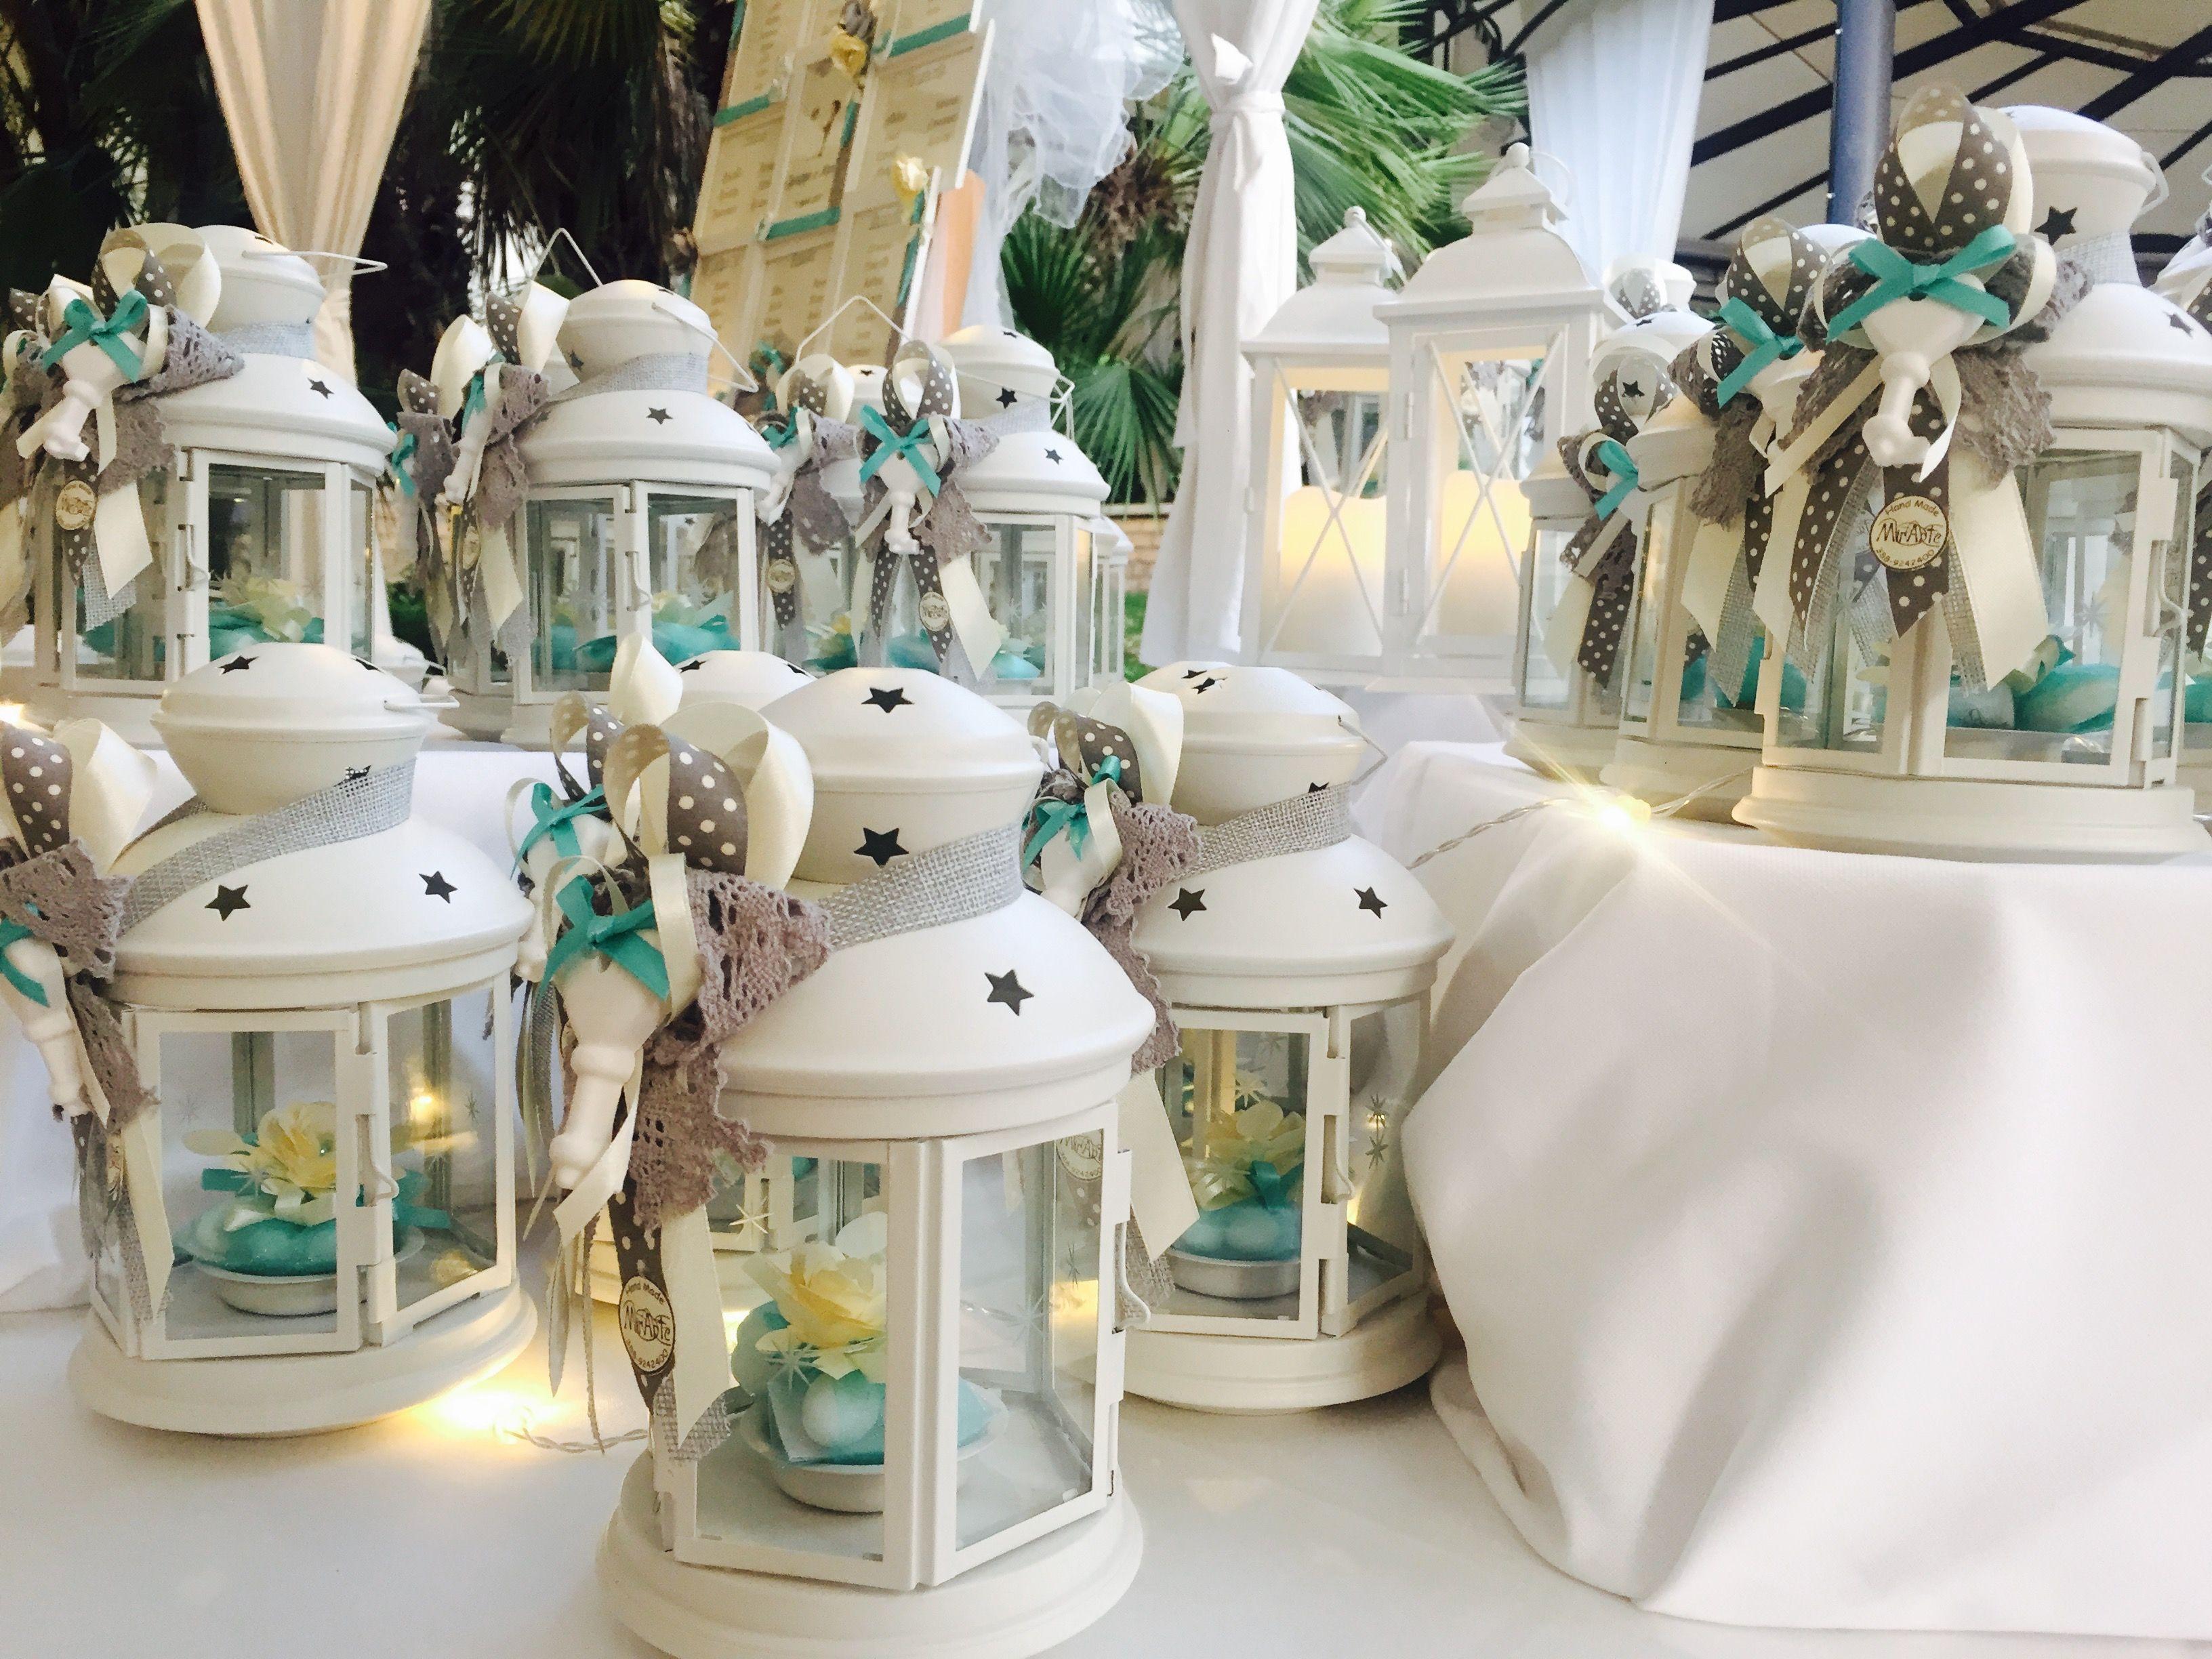 Idee Regalo Natale Ikea.Lanterne Ikea Bomboniera Ikea Hacks Matrimonio Tiffany